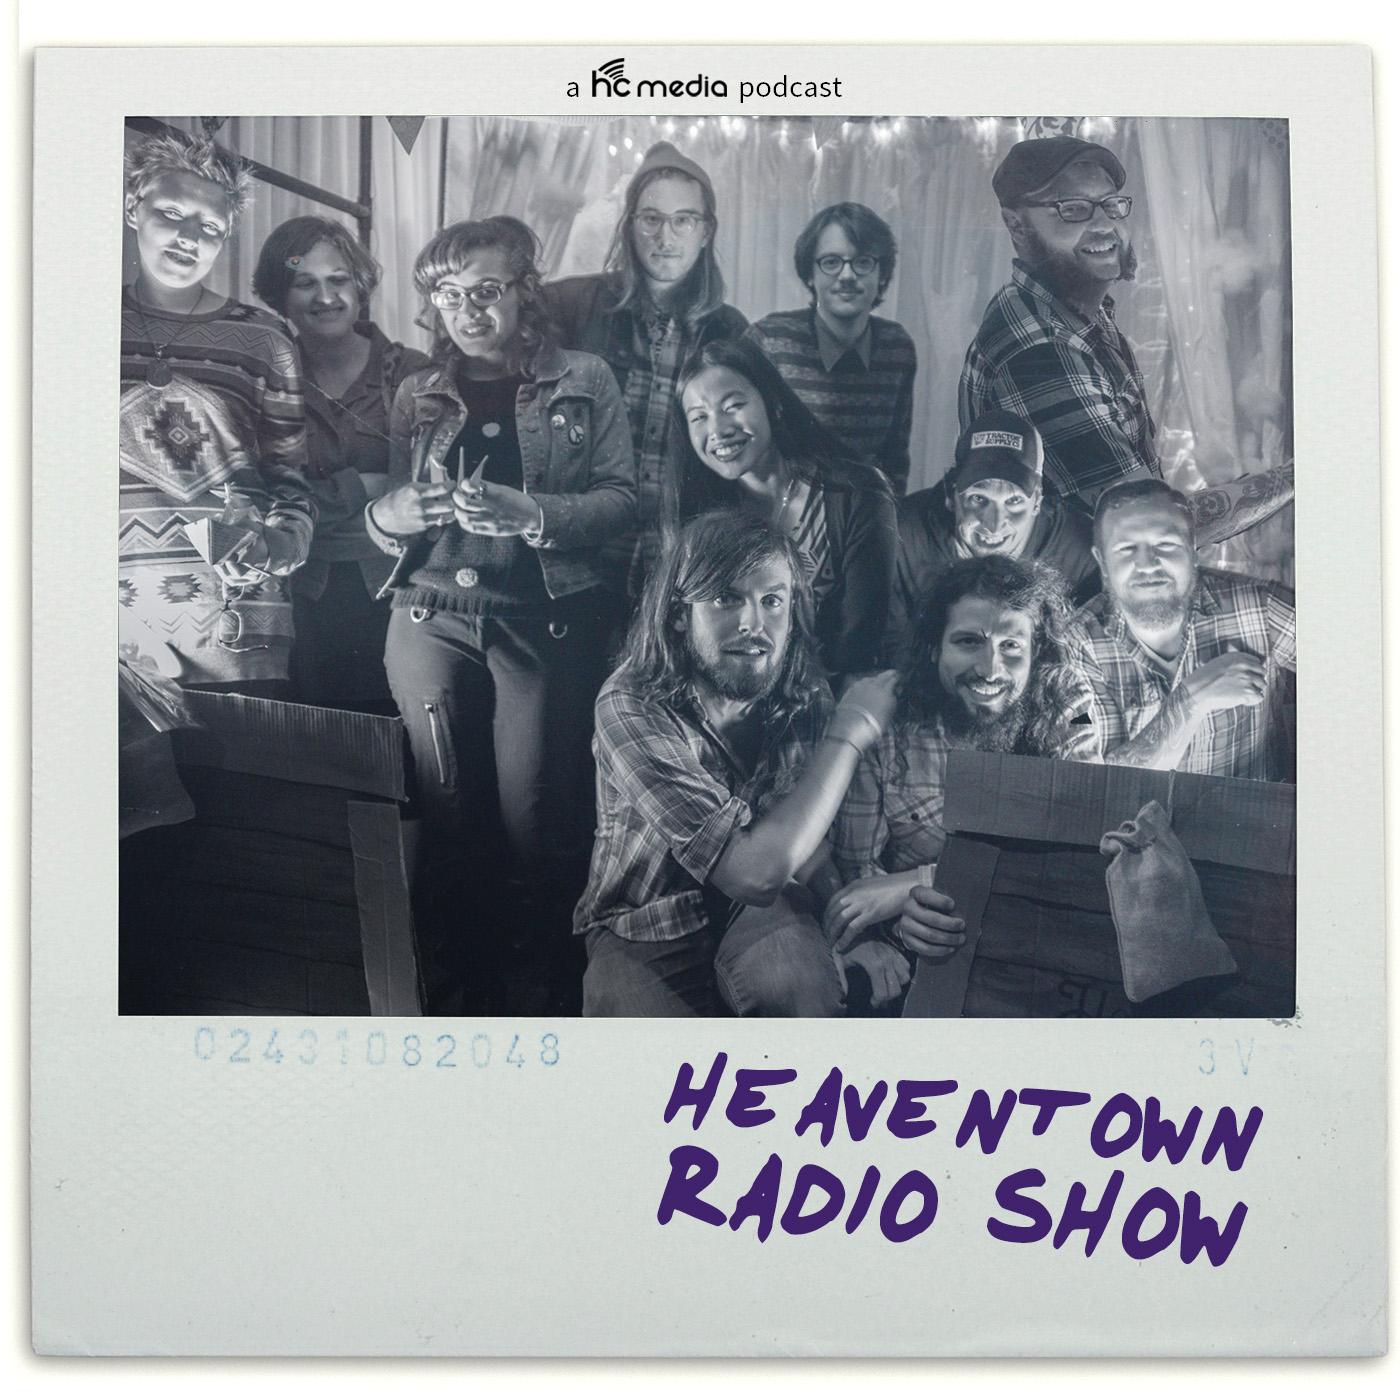 Heaventown Radio Show